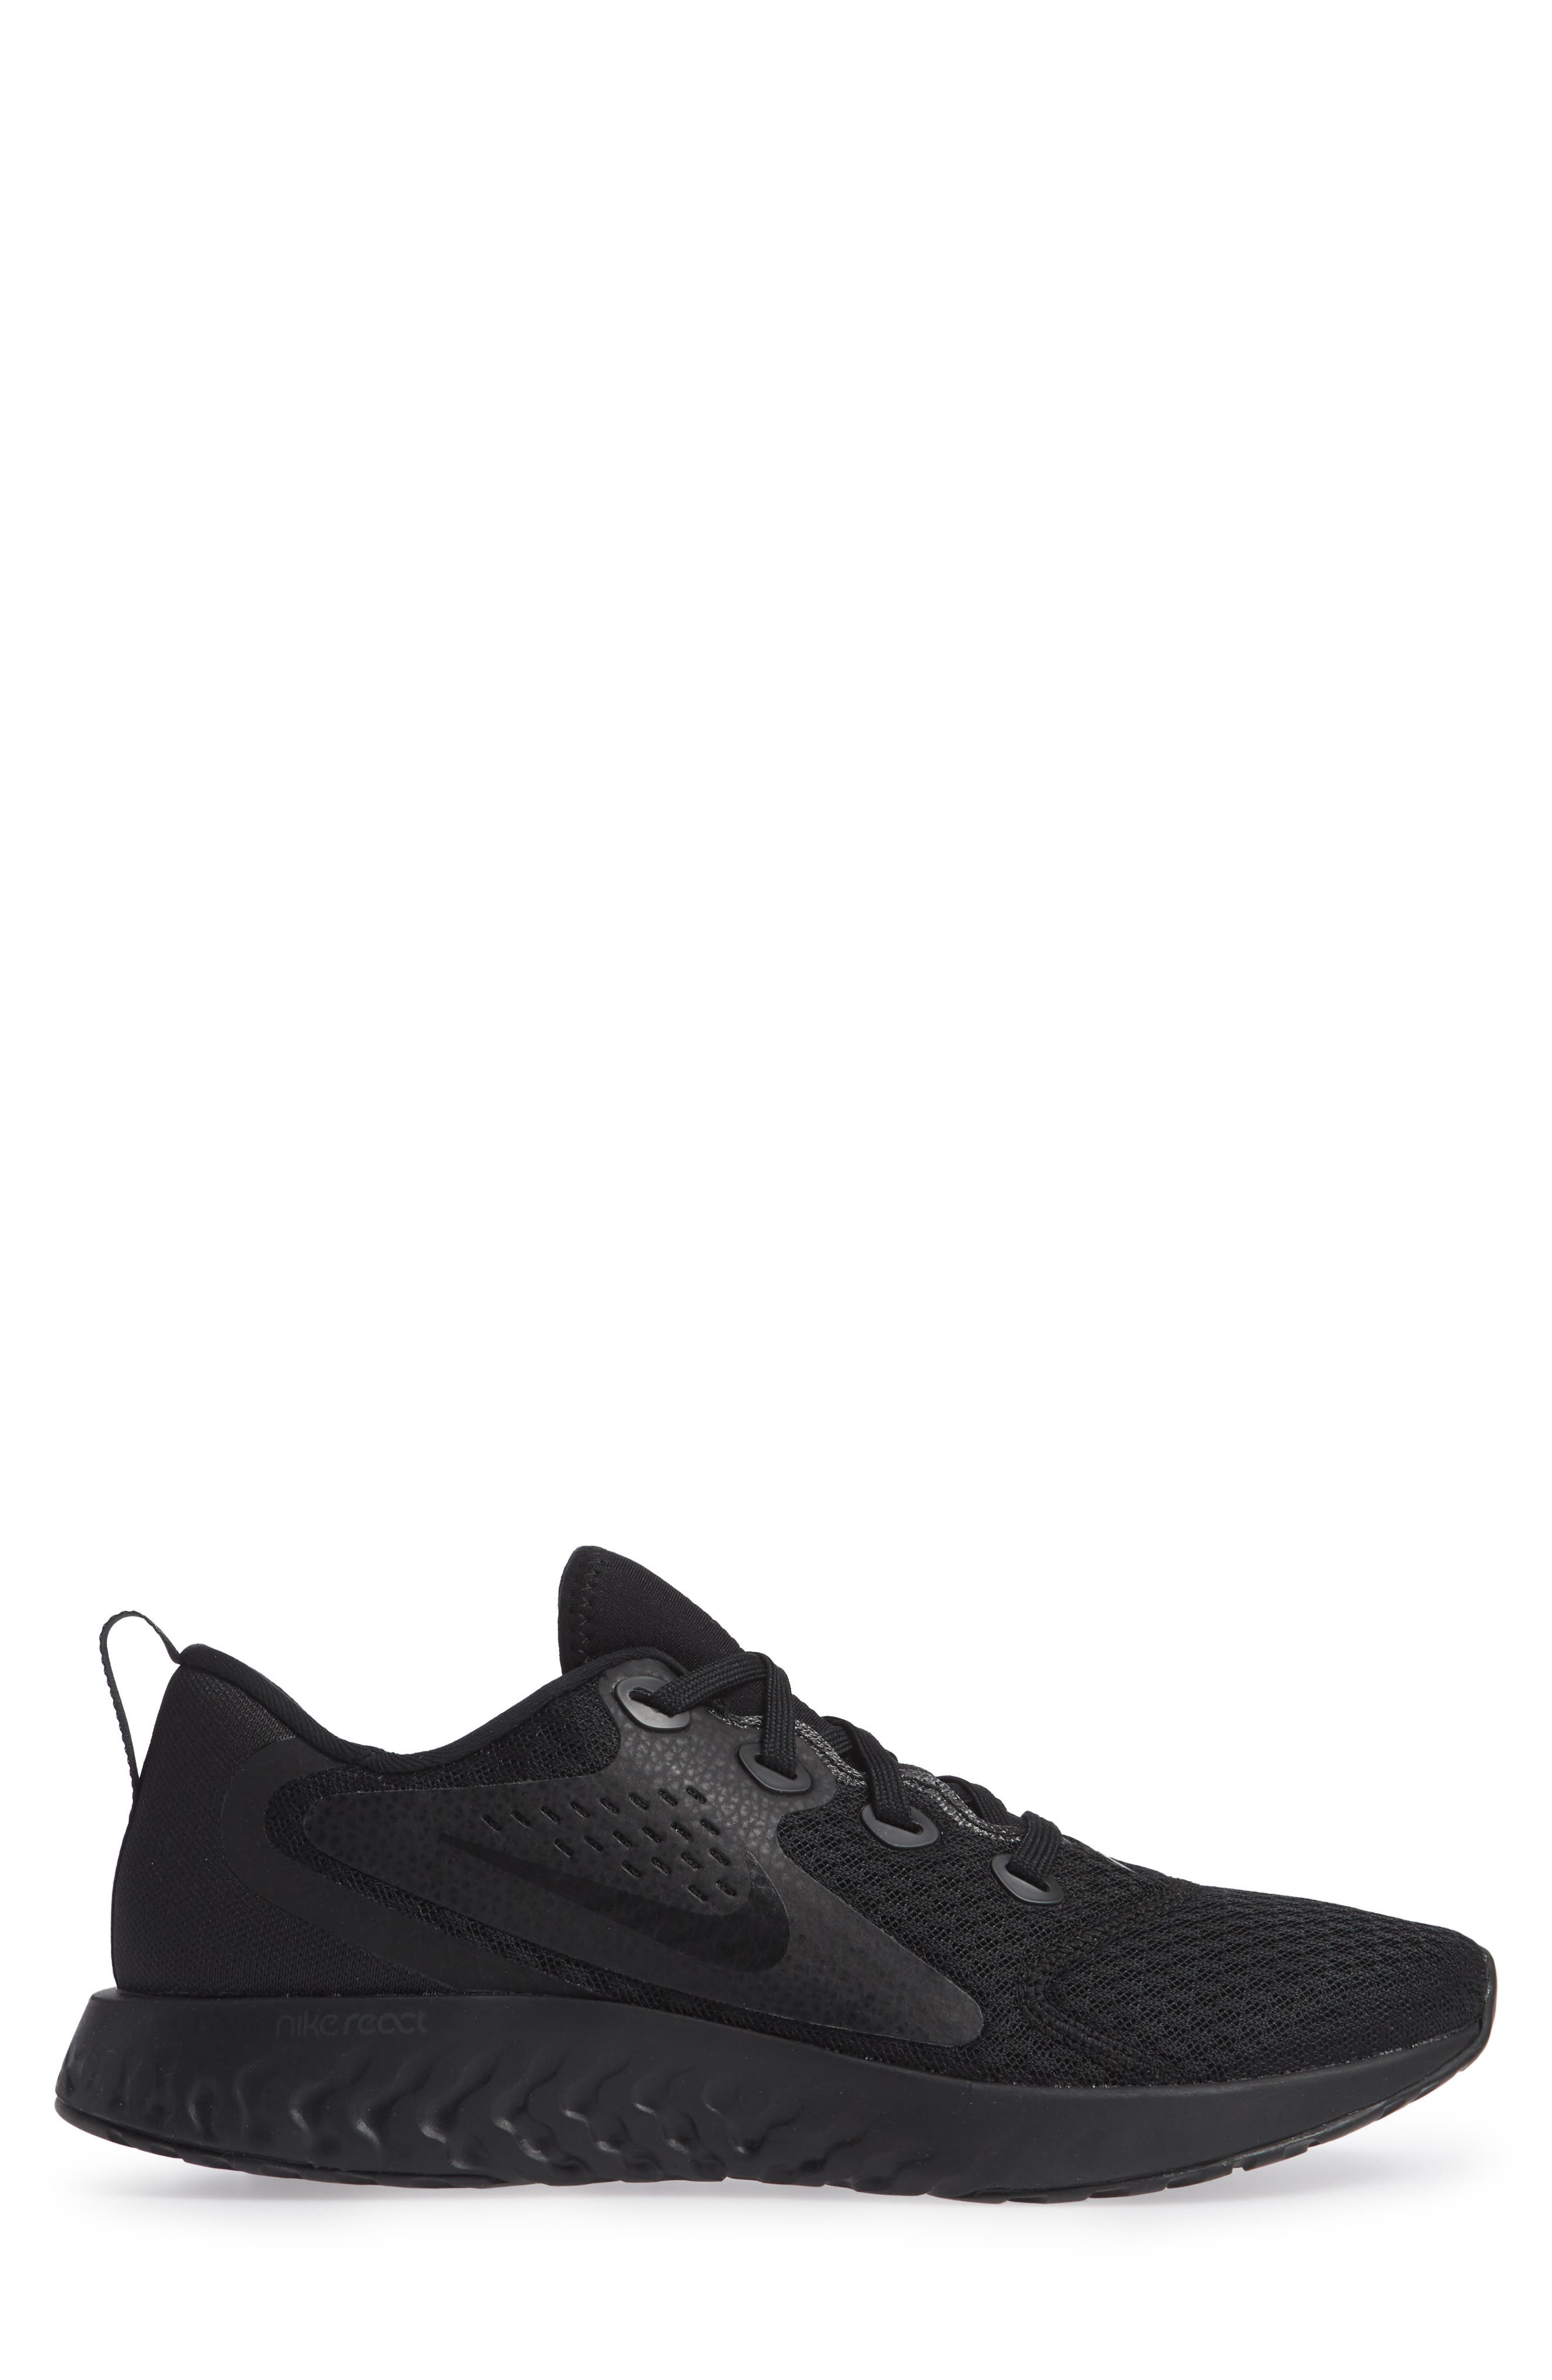 Rebel React Sneaker,                             Alternate thumbnail 3, color,                             BLACK/ BLACK